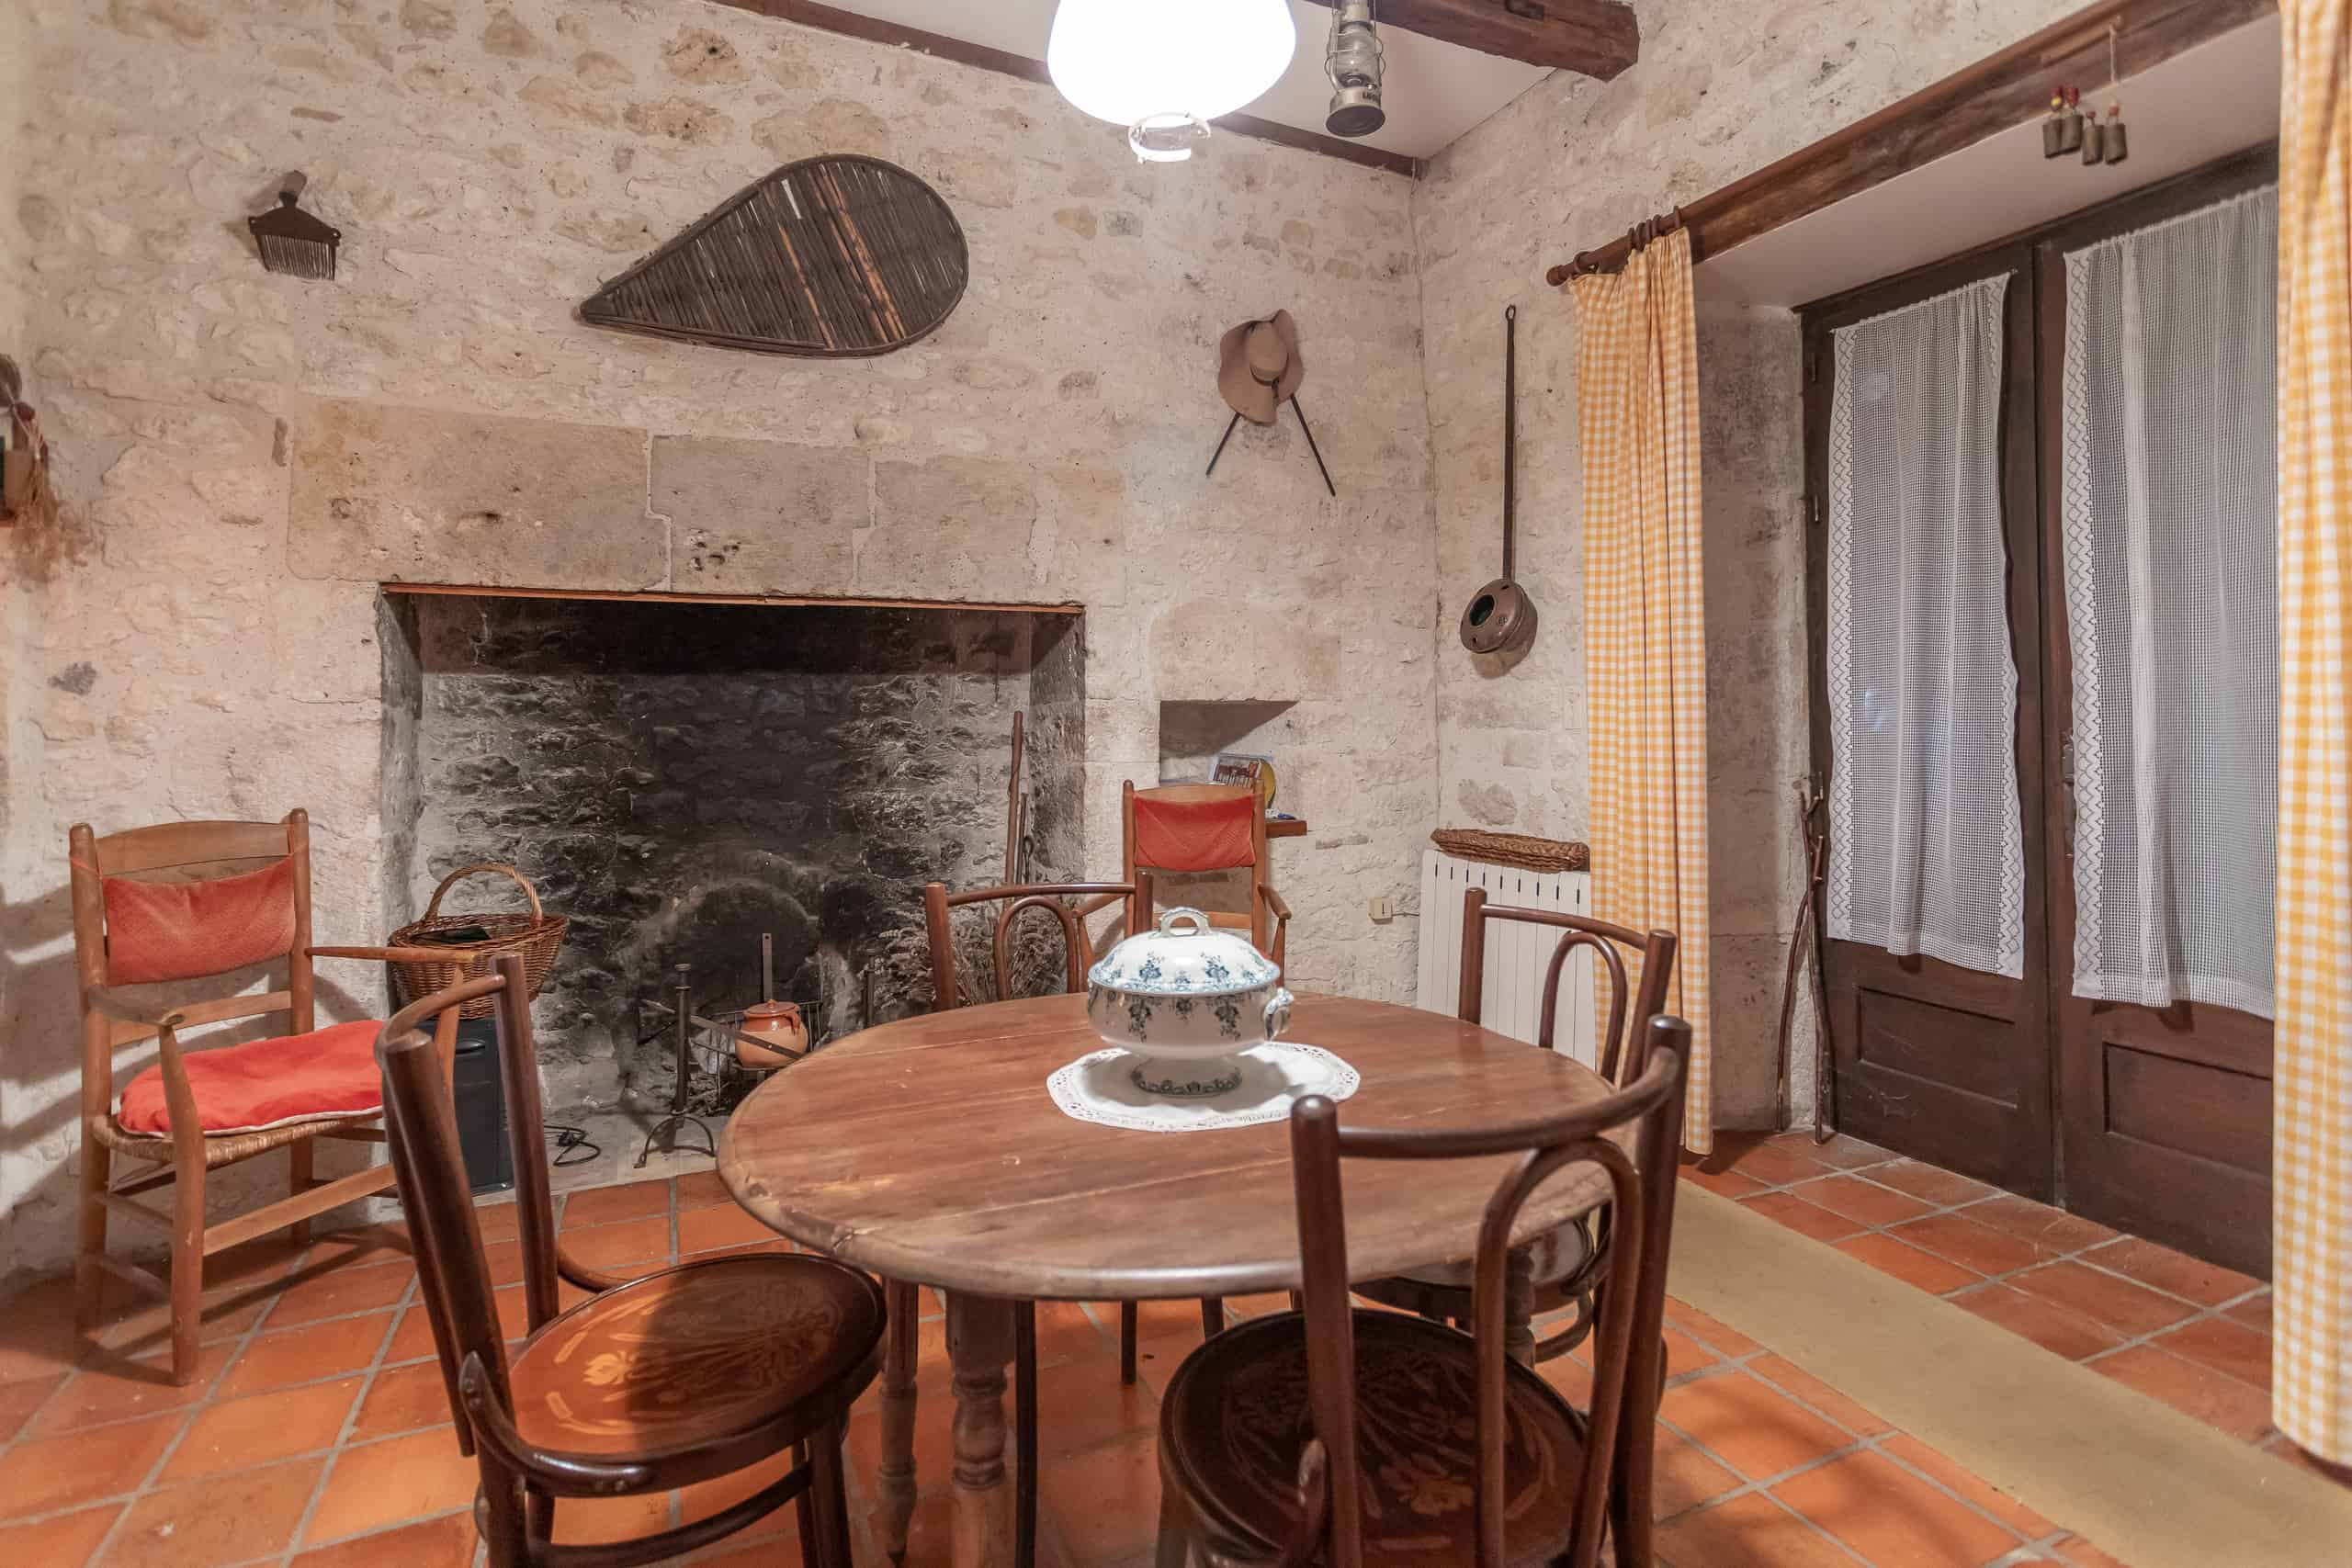 Diningroom-47015